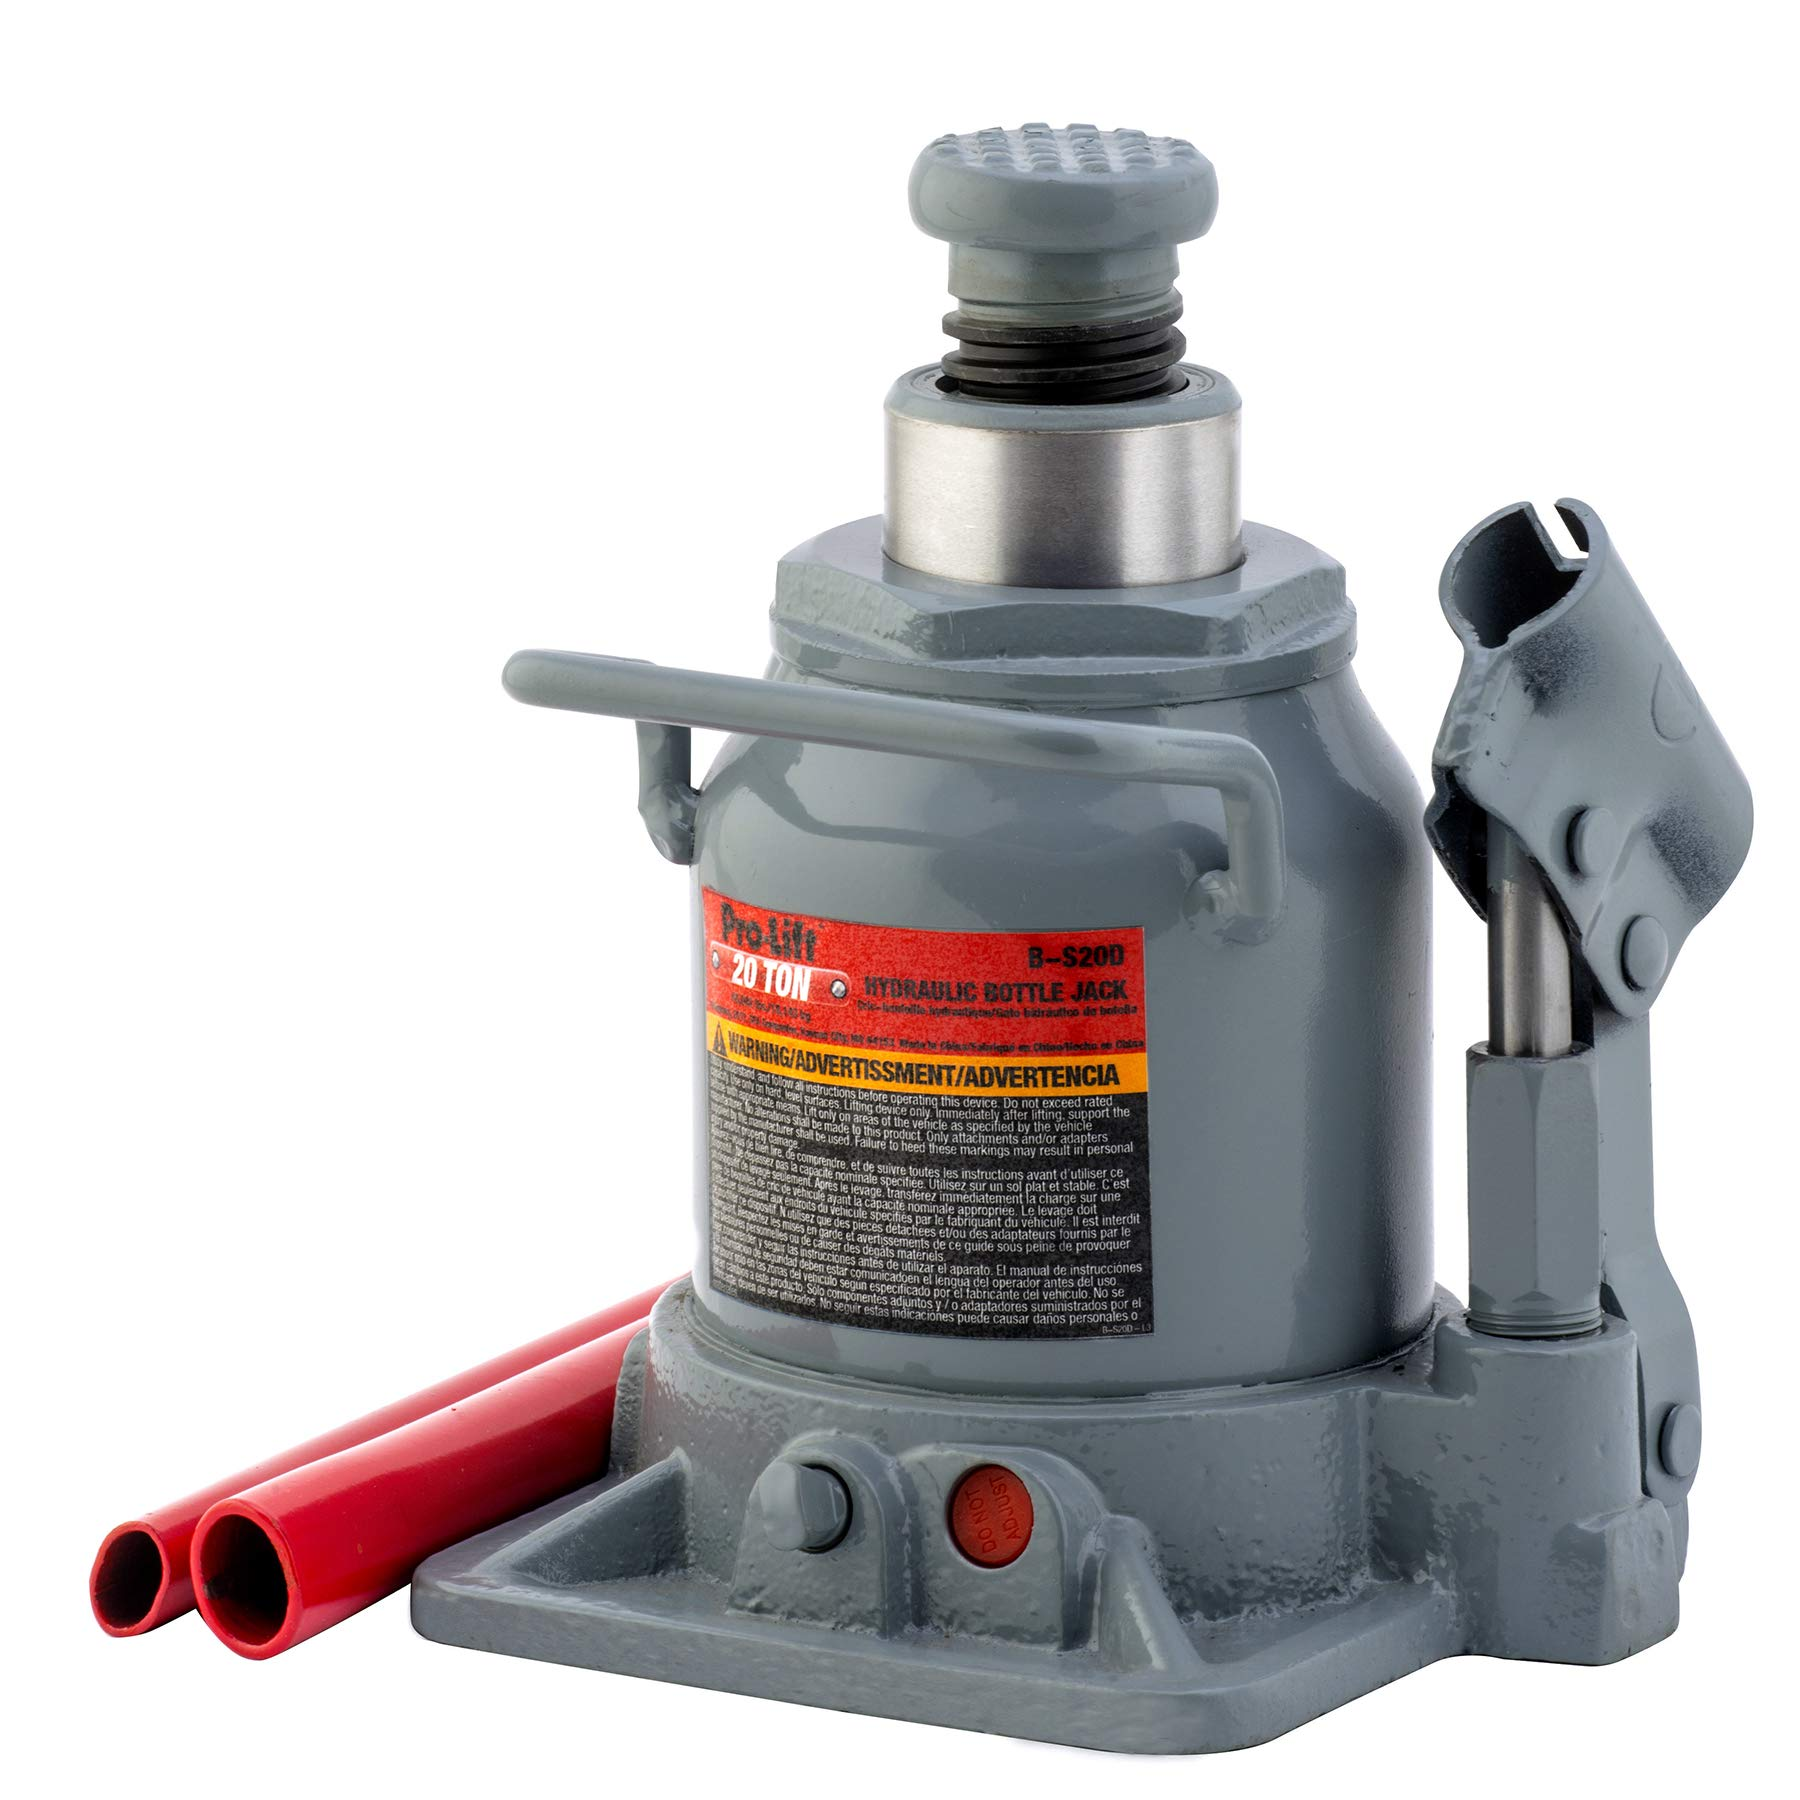 Pro-LifT B-S20D Grey Hydraulic Bottle Jack - 20 Ton Capacity by Pro-LifT